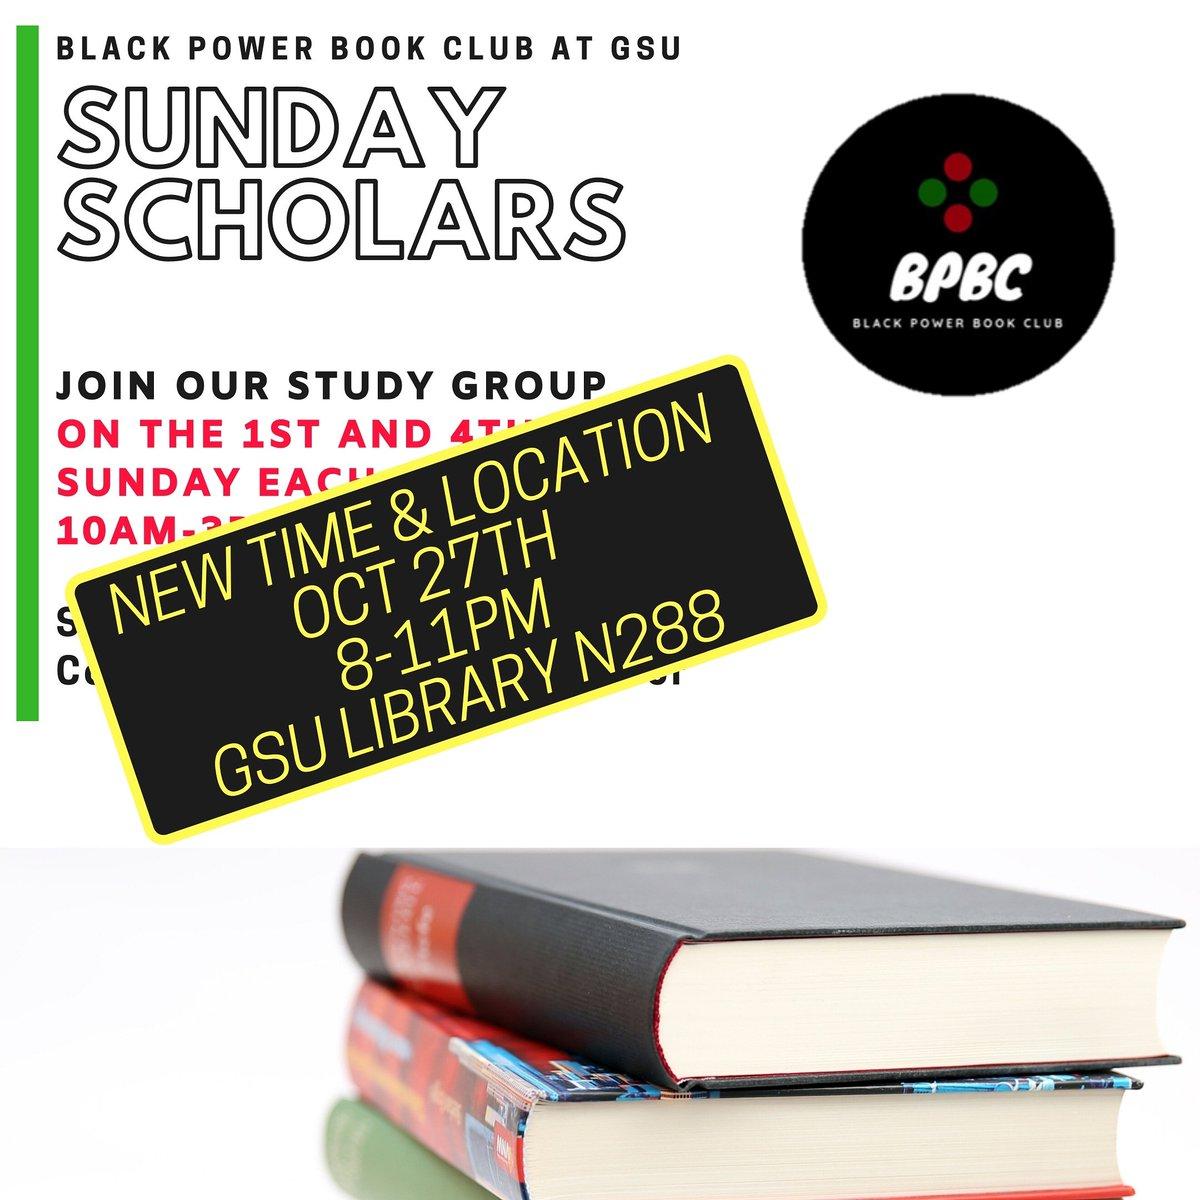 For the night owls and those who work late. Come study with Black Power Book Club!  #Study #GeorgiaStateUniversity #GSU19 #GSU20 #GSU21  #GSU22